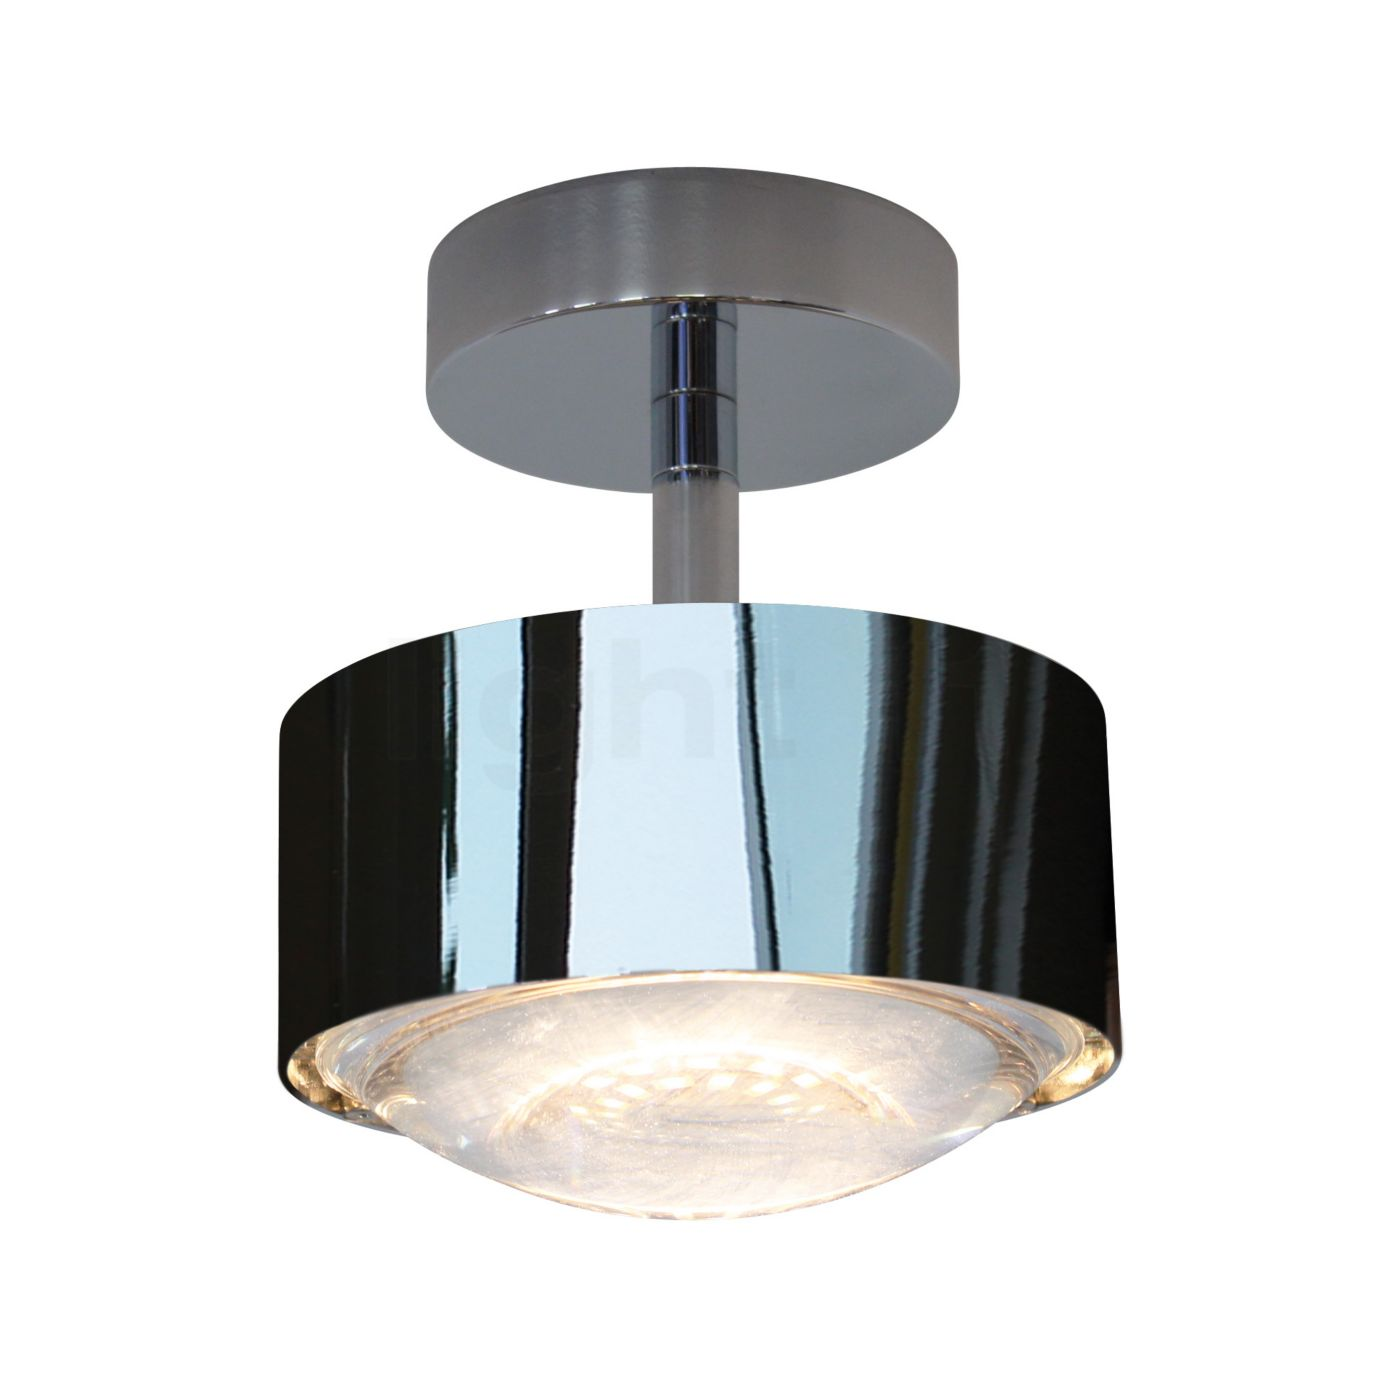 top light puk maxx turn downlight led deckenleuchte. Black Bedroom Furniture Sets. Home Design Ideas